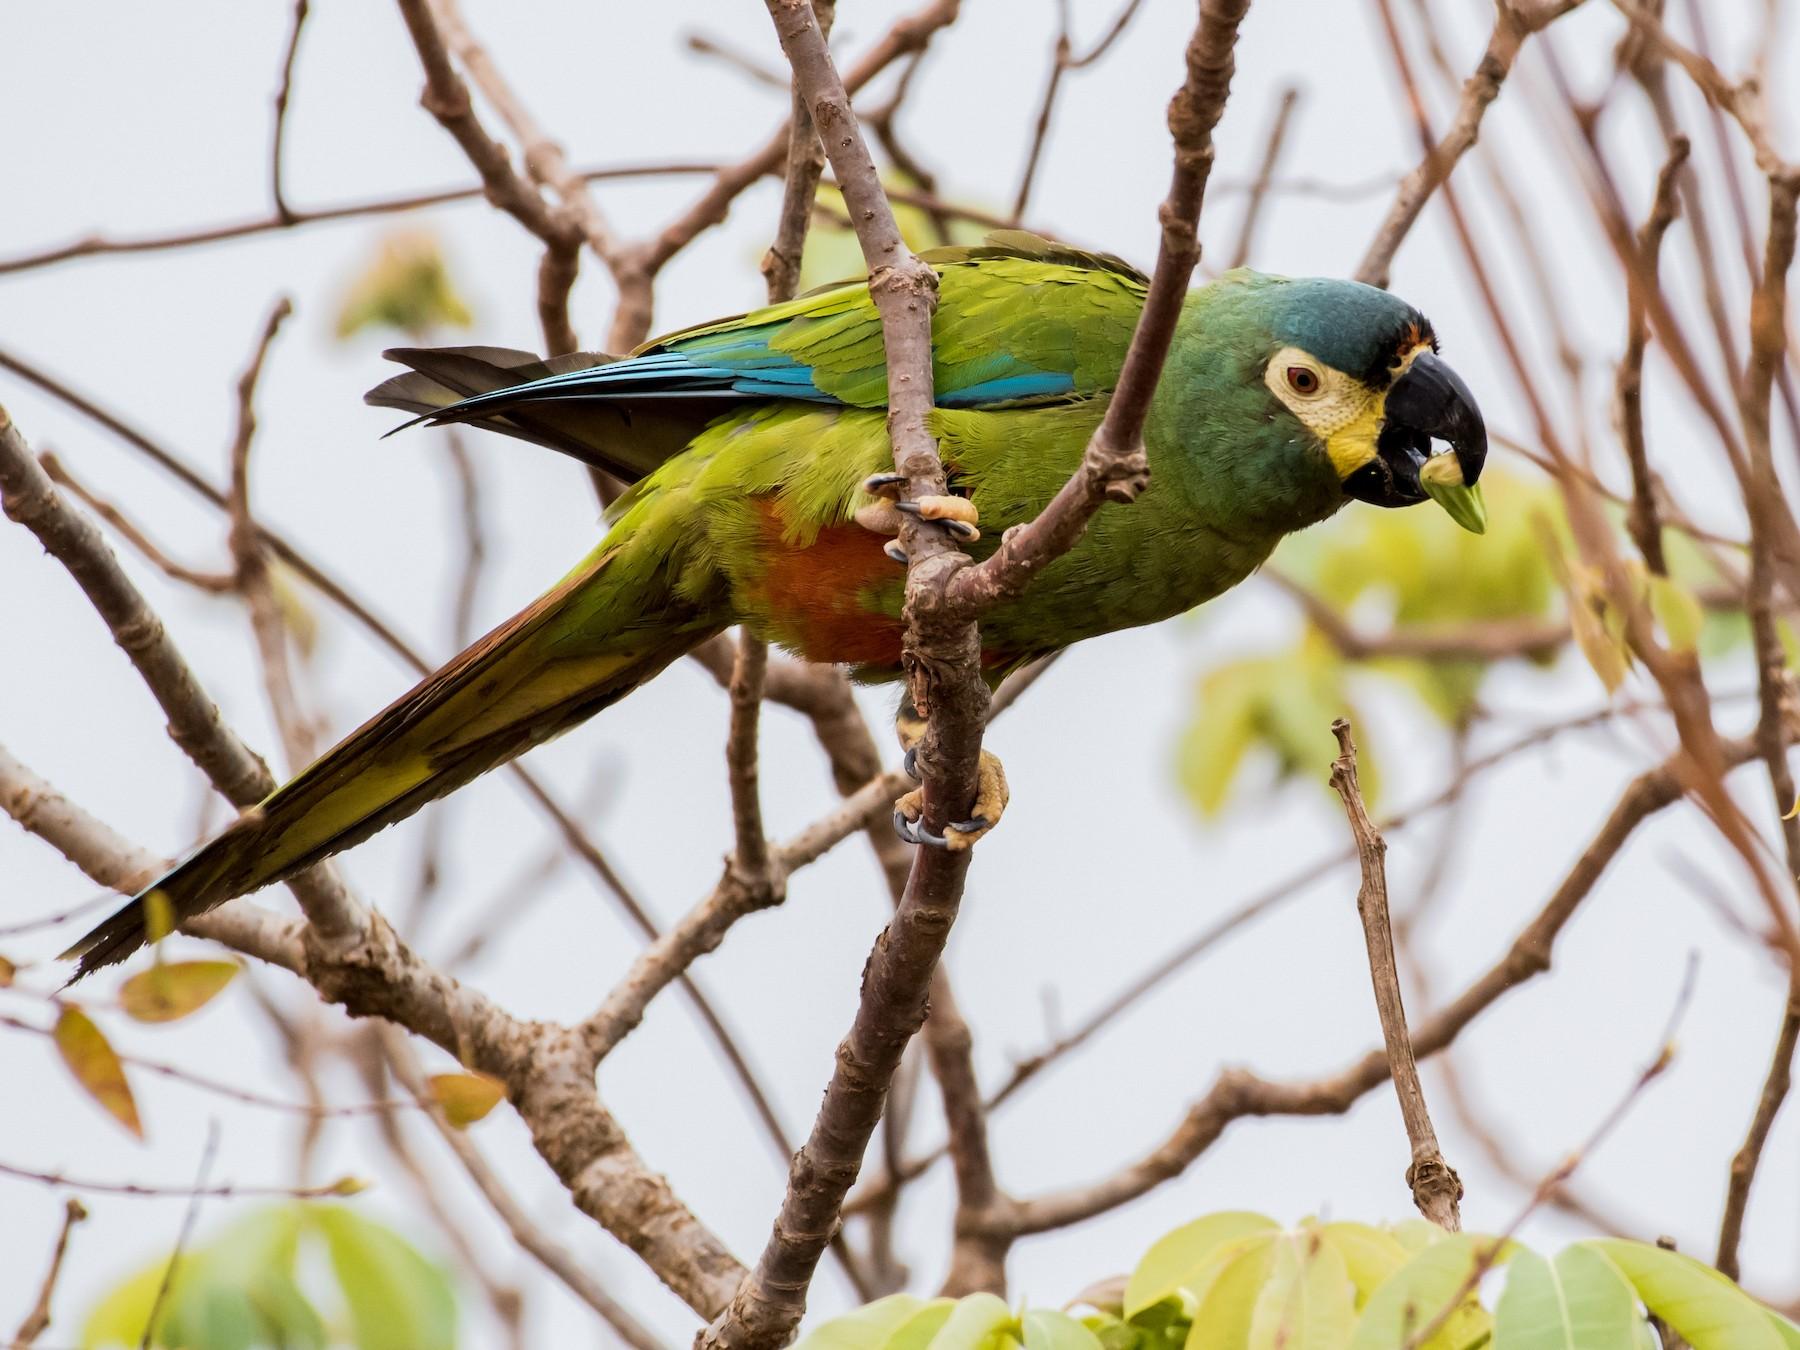 Blue-winged Macaw - Hank Davis